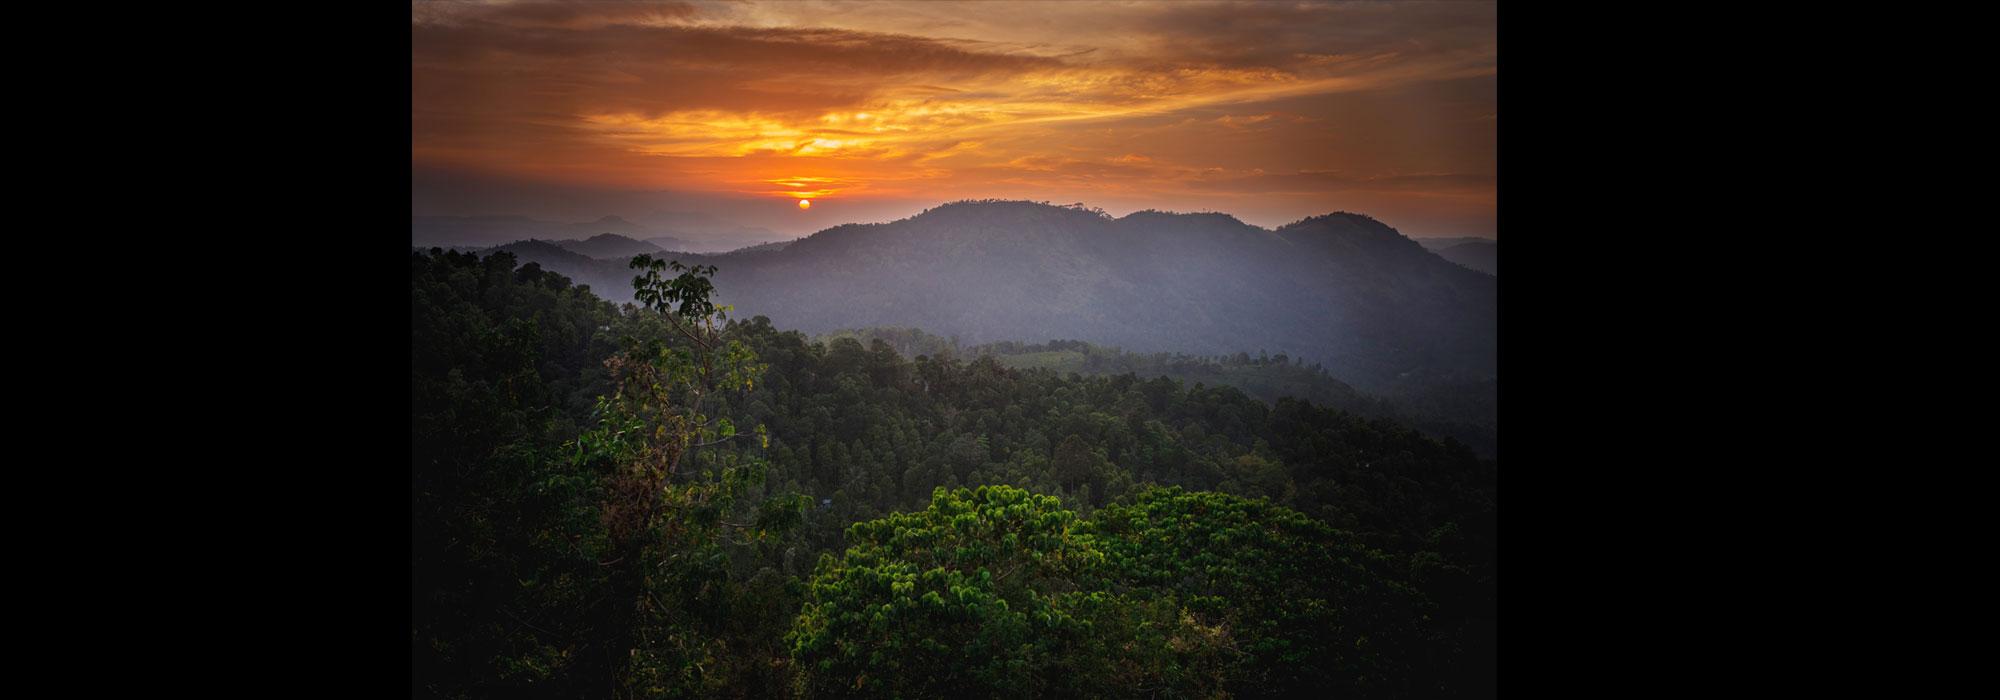 peyzazh-photo-koshkin-konstantin_srilanka1